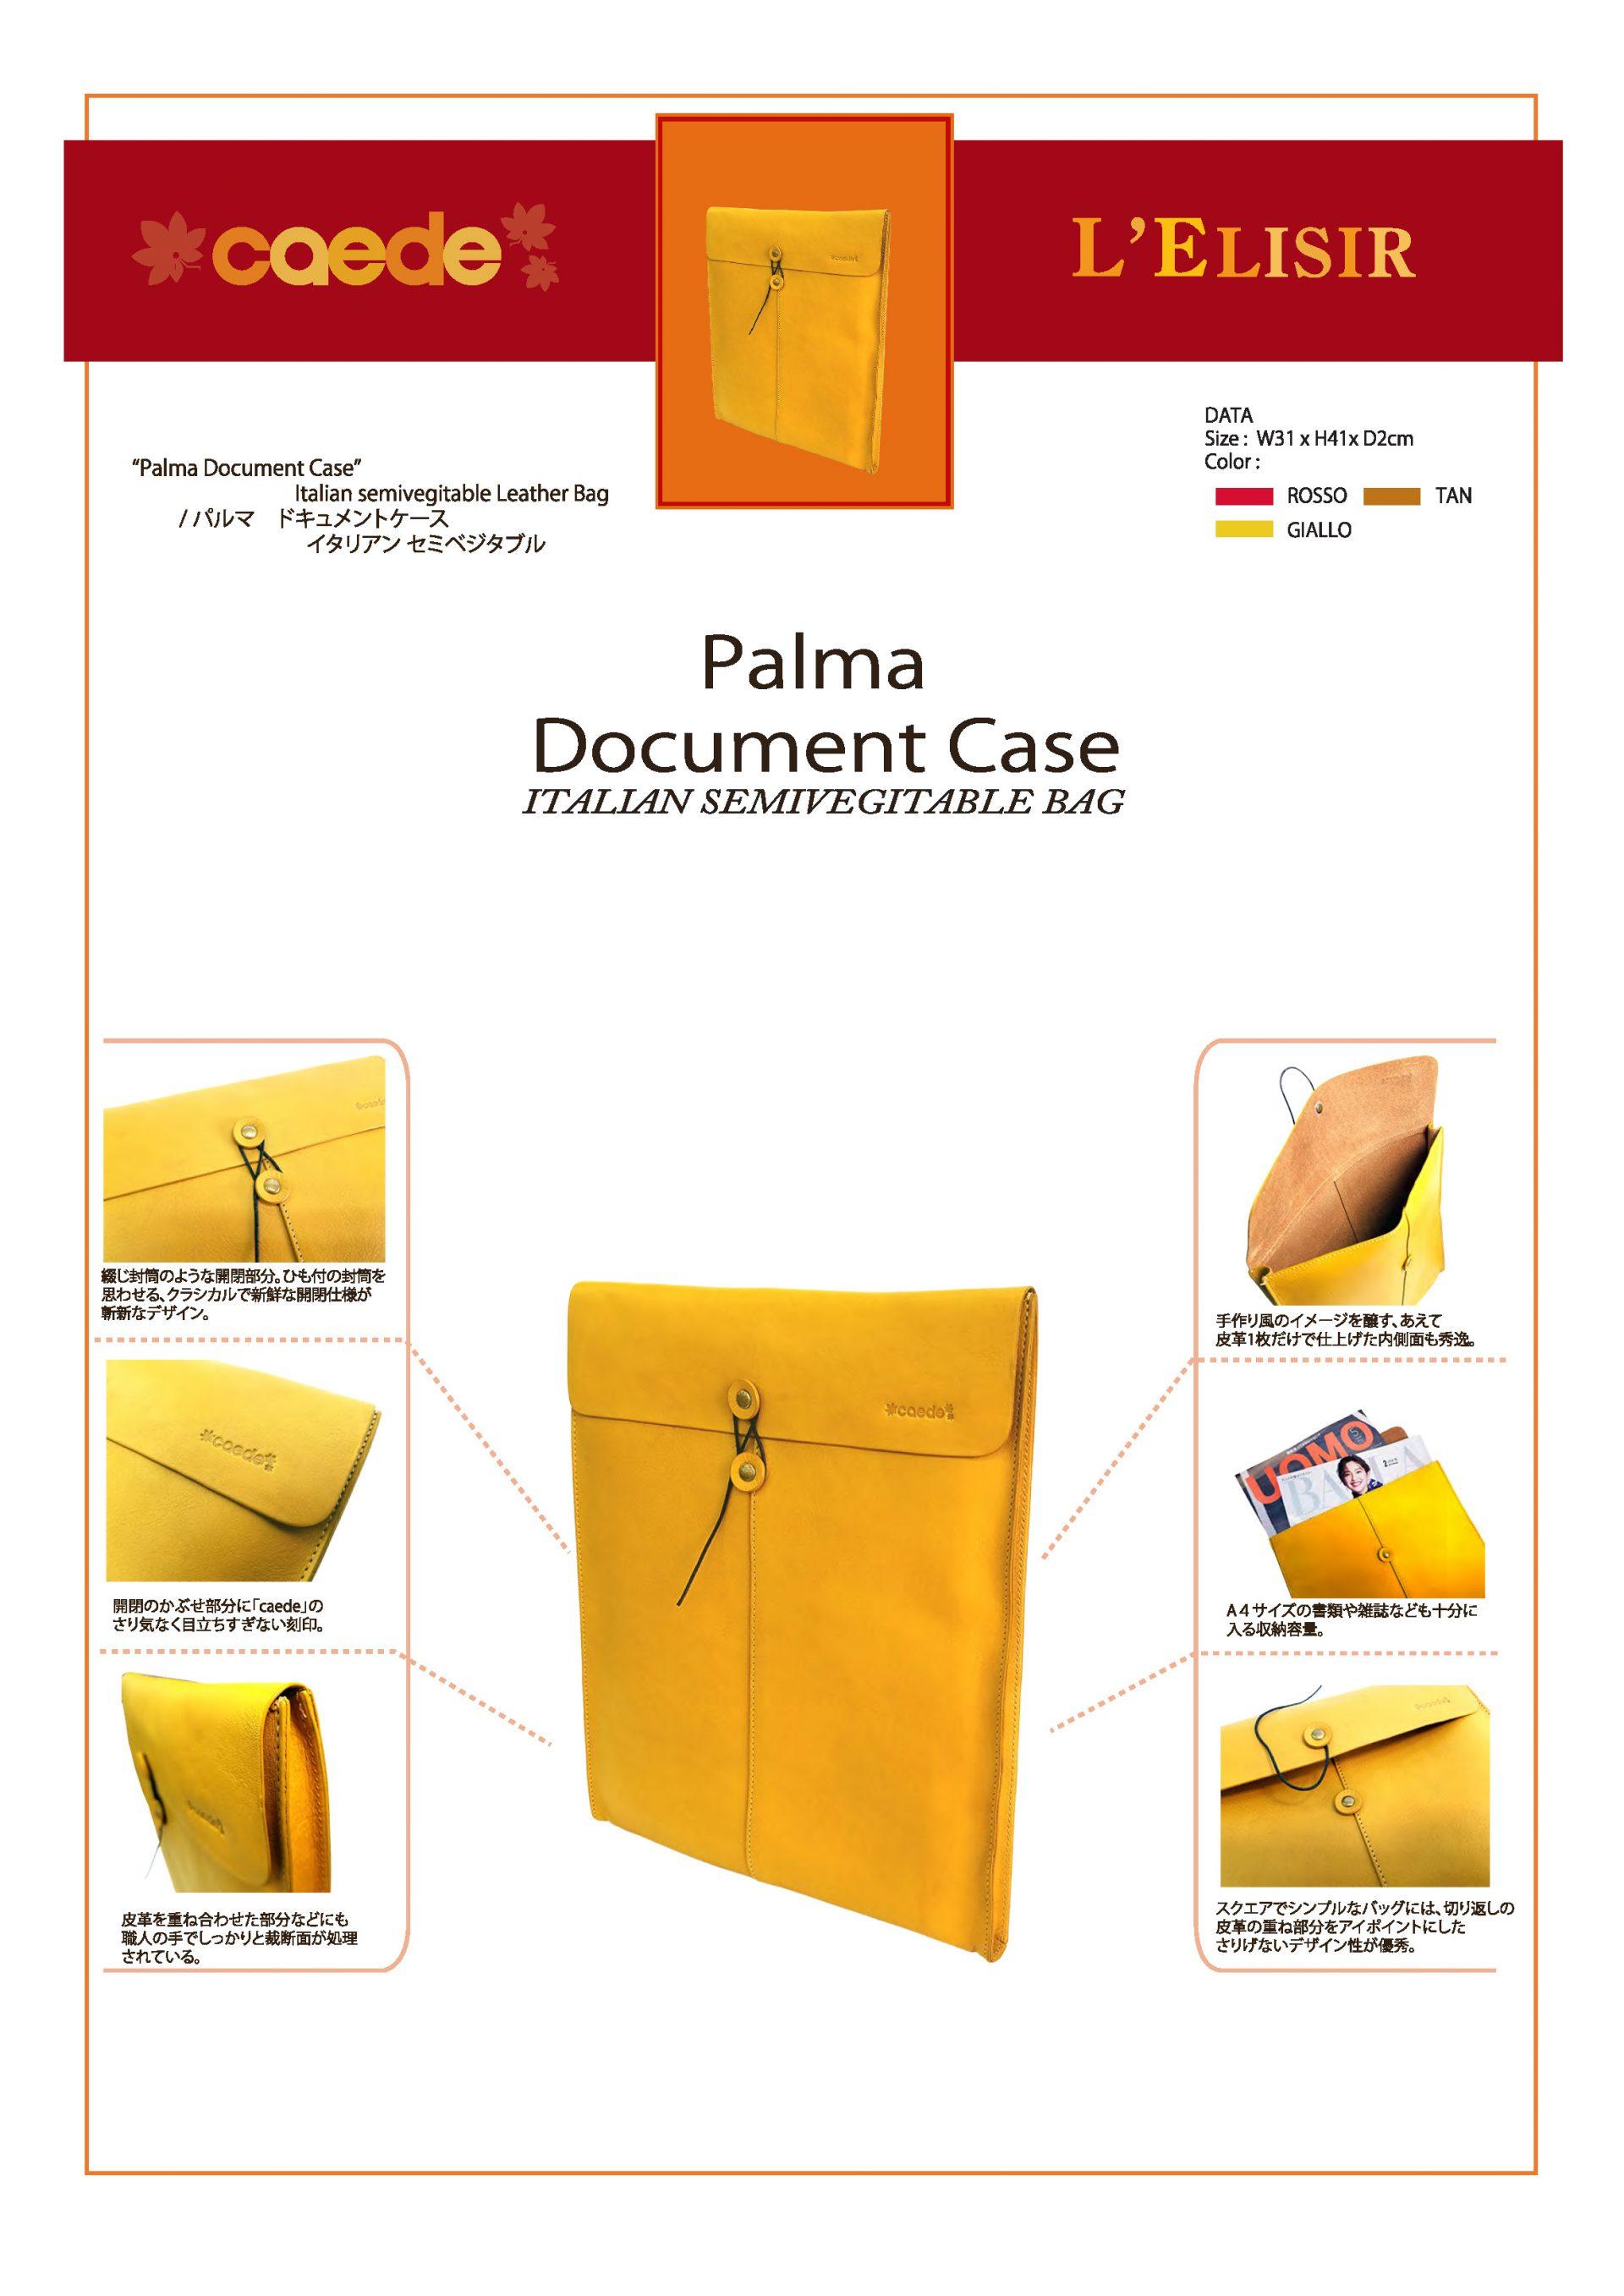 59531 palma document case